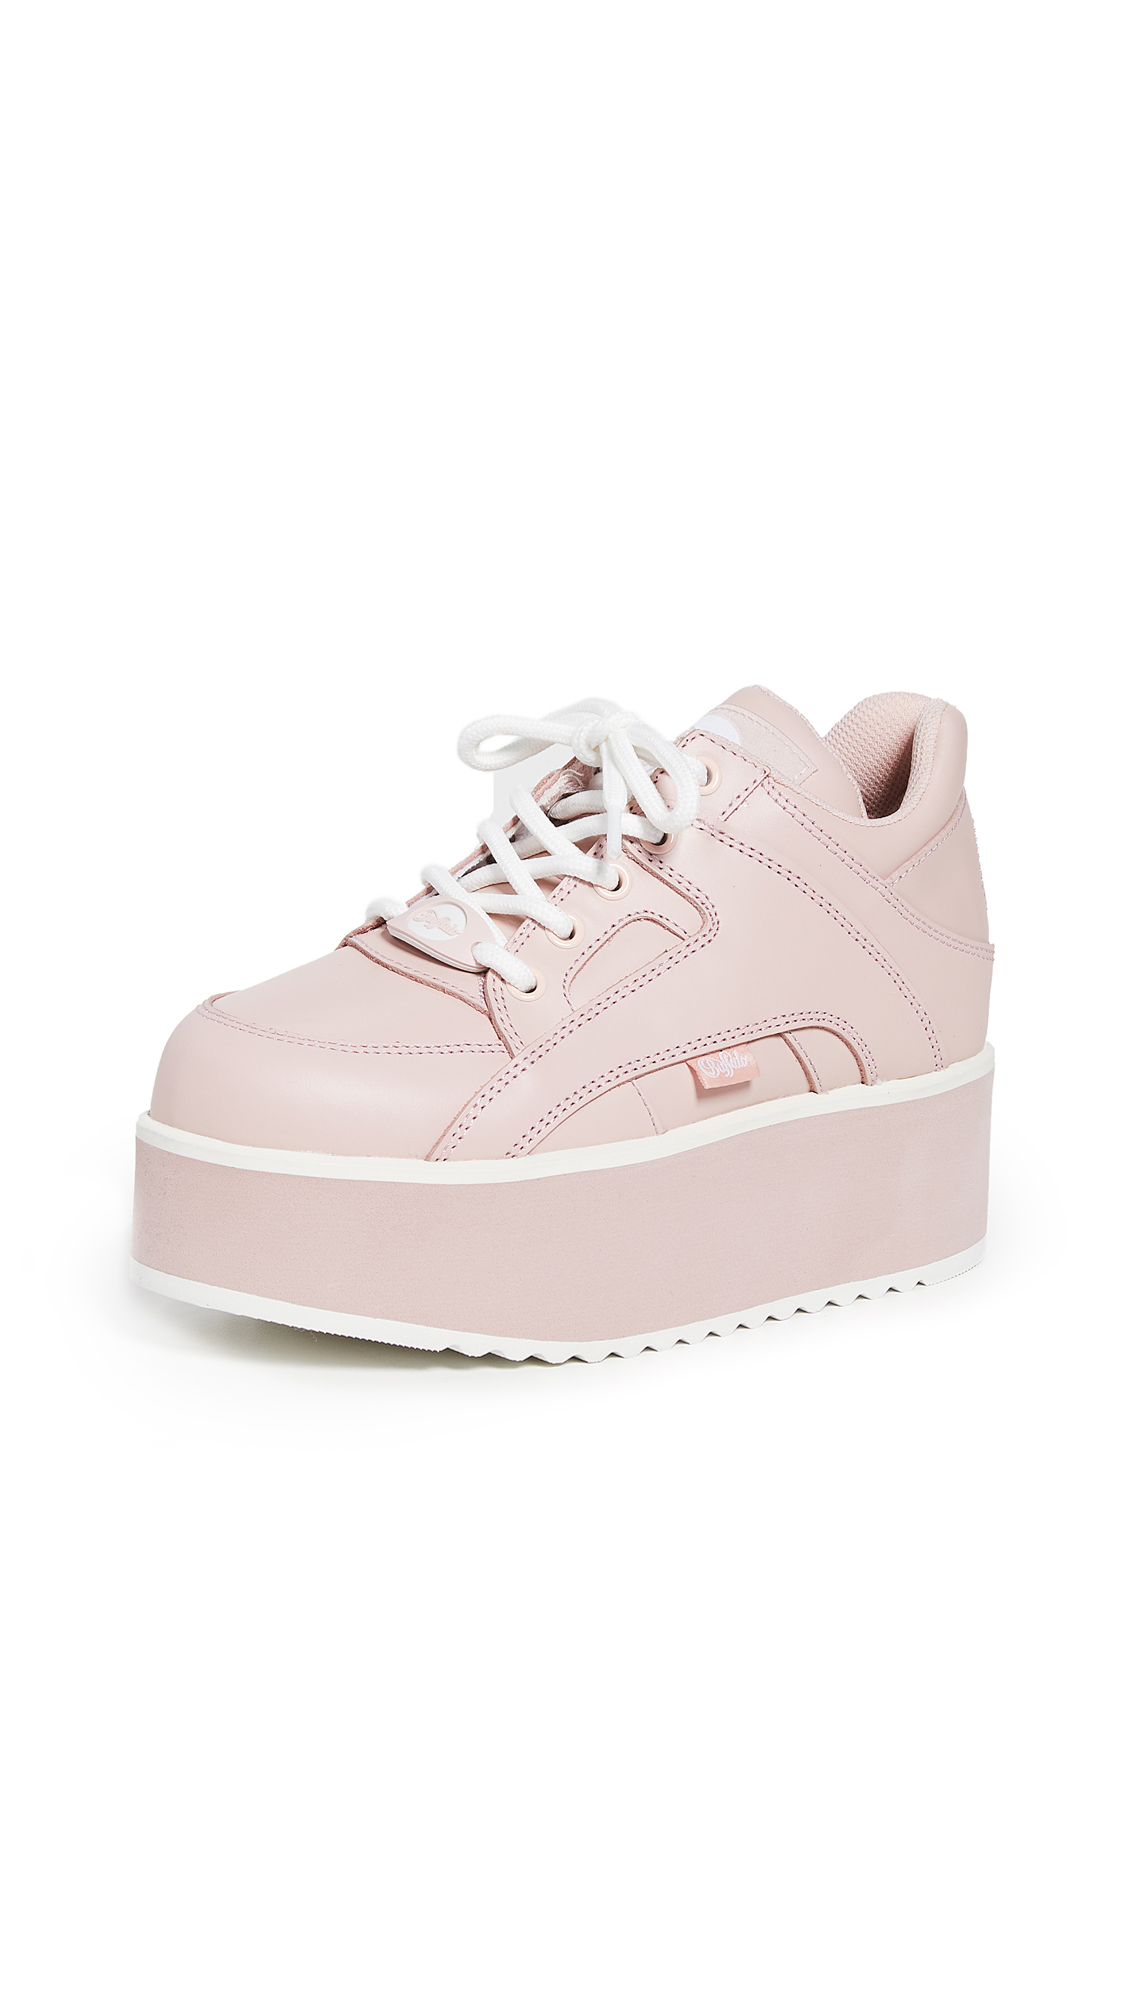 Buffalo London Rising Towers Sneakers - Baby Pink